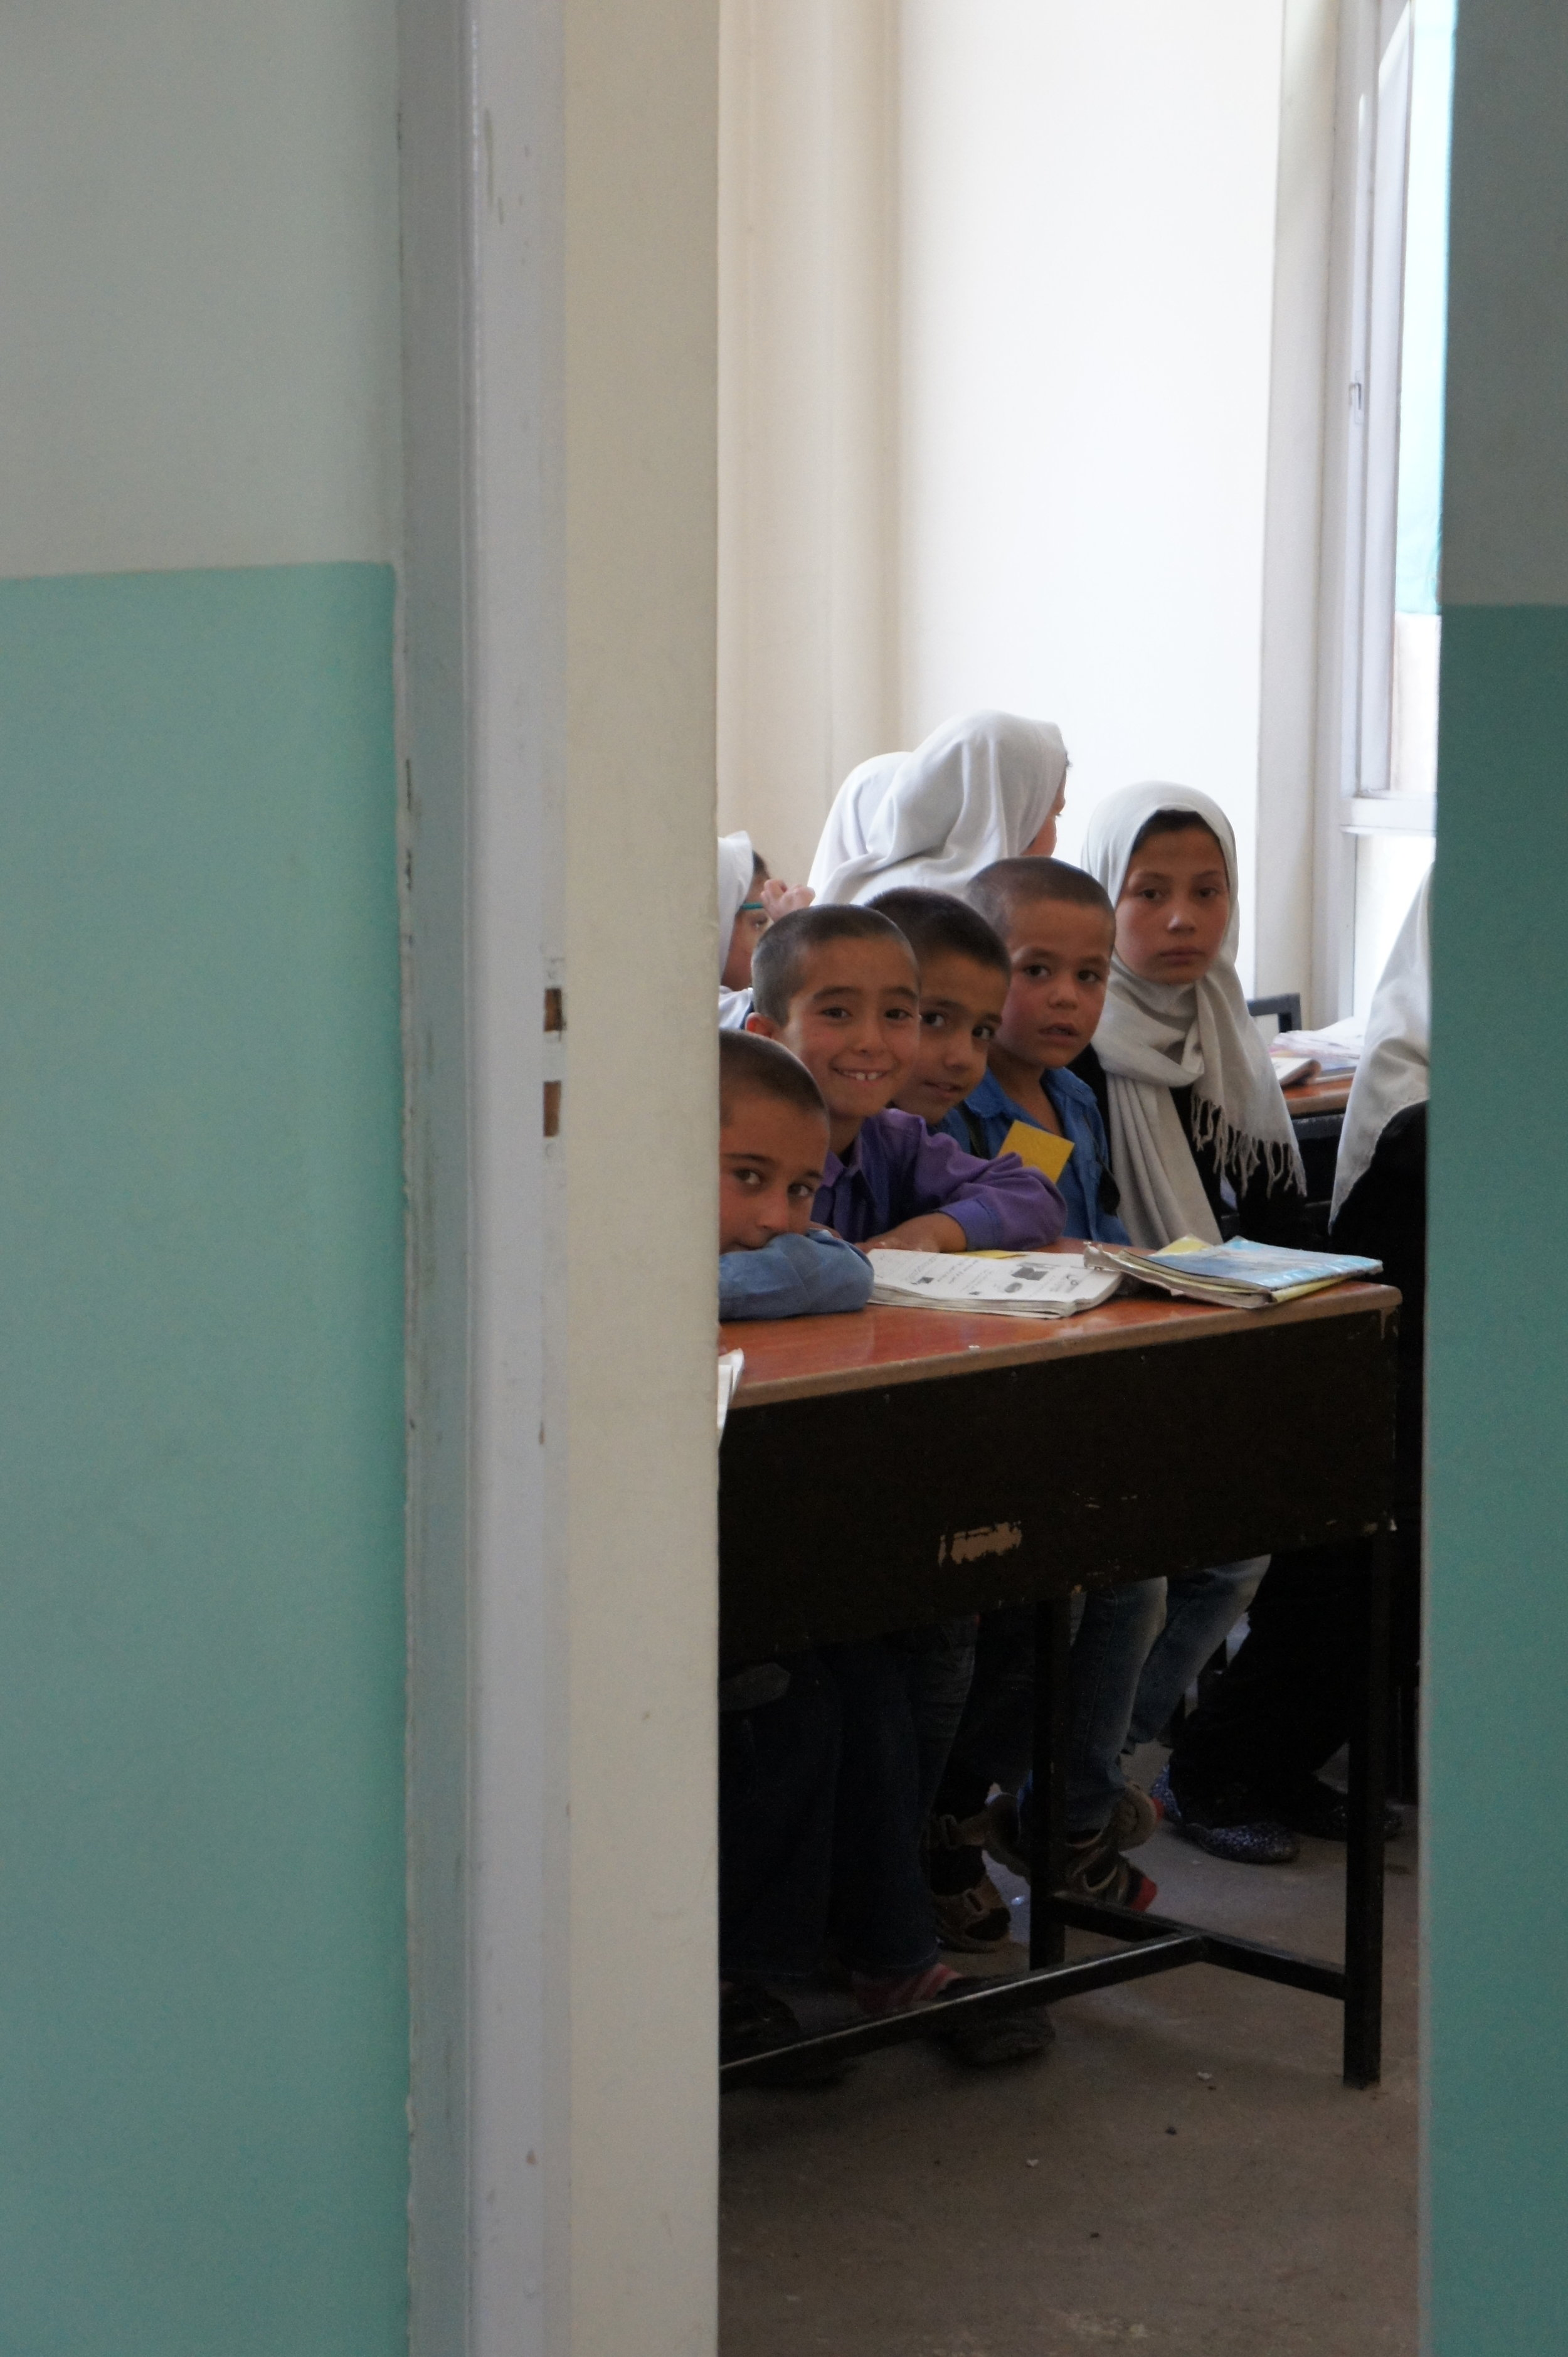 Jameel - #3035 | MaleAge When Starting School: 7